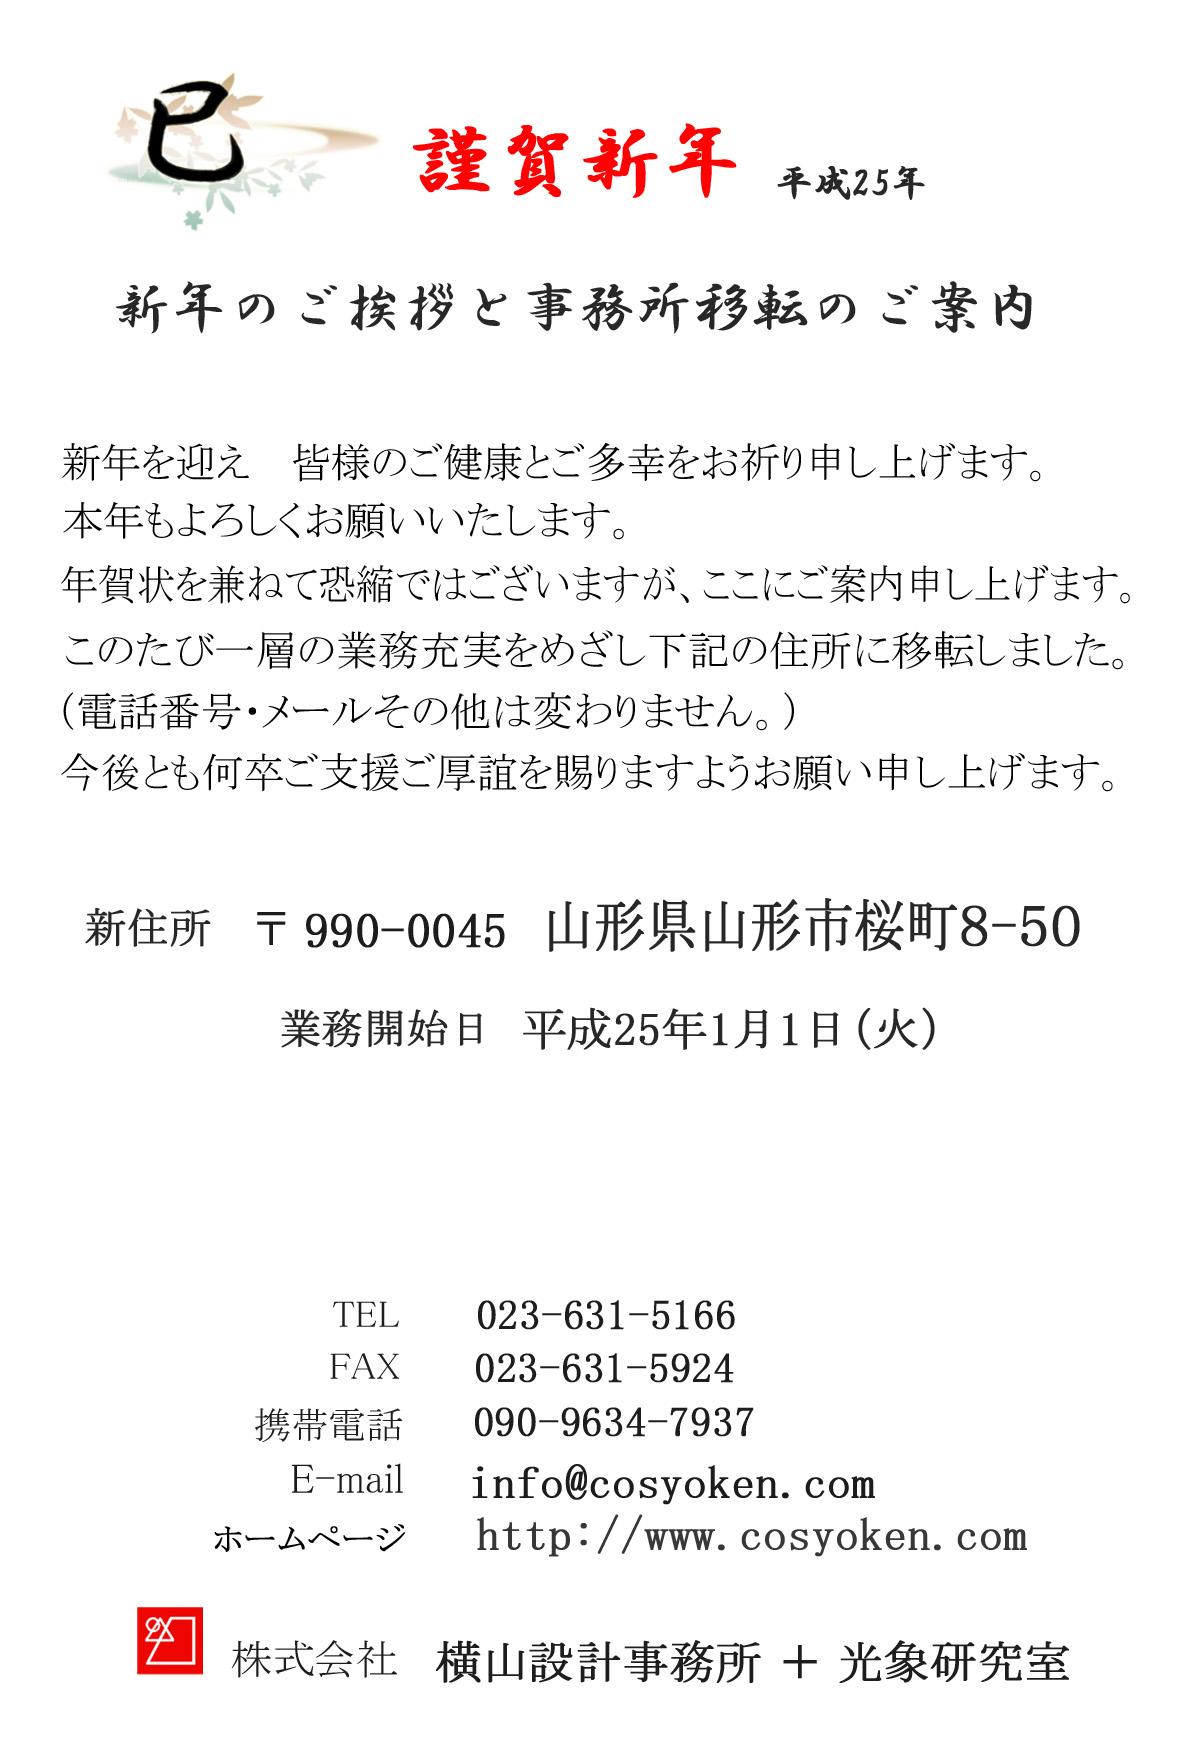 c0097137_15461560.jpg